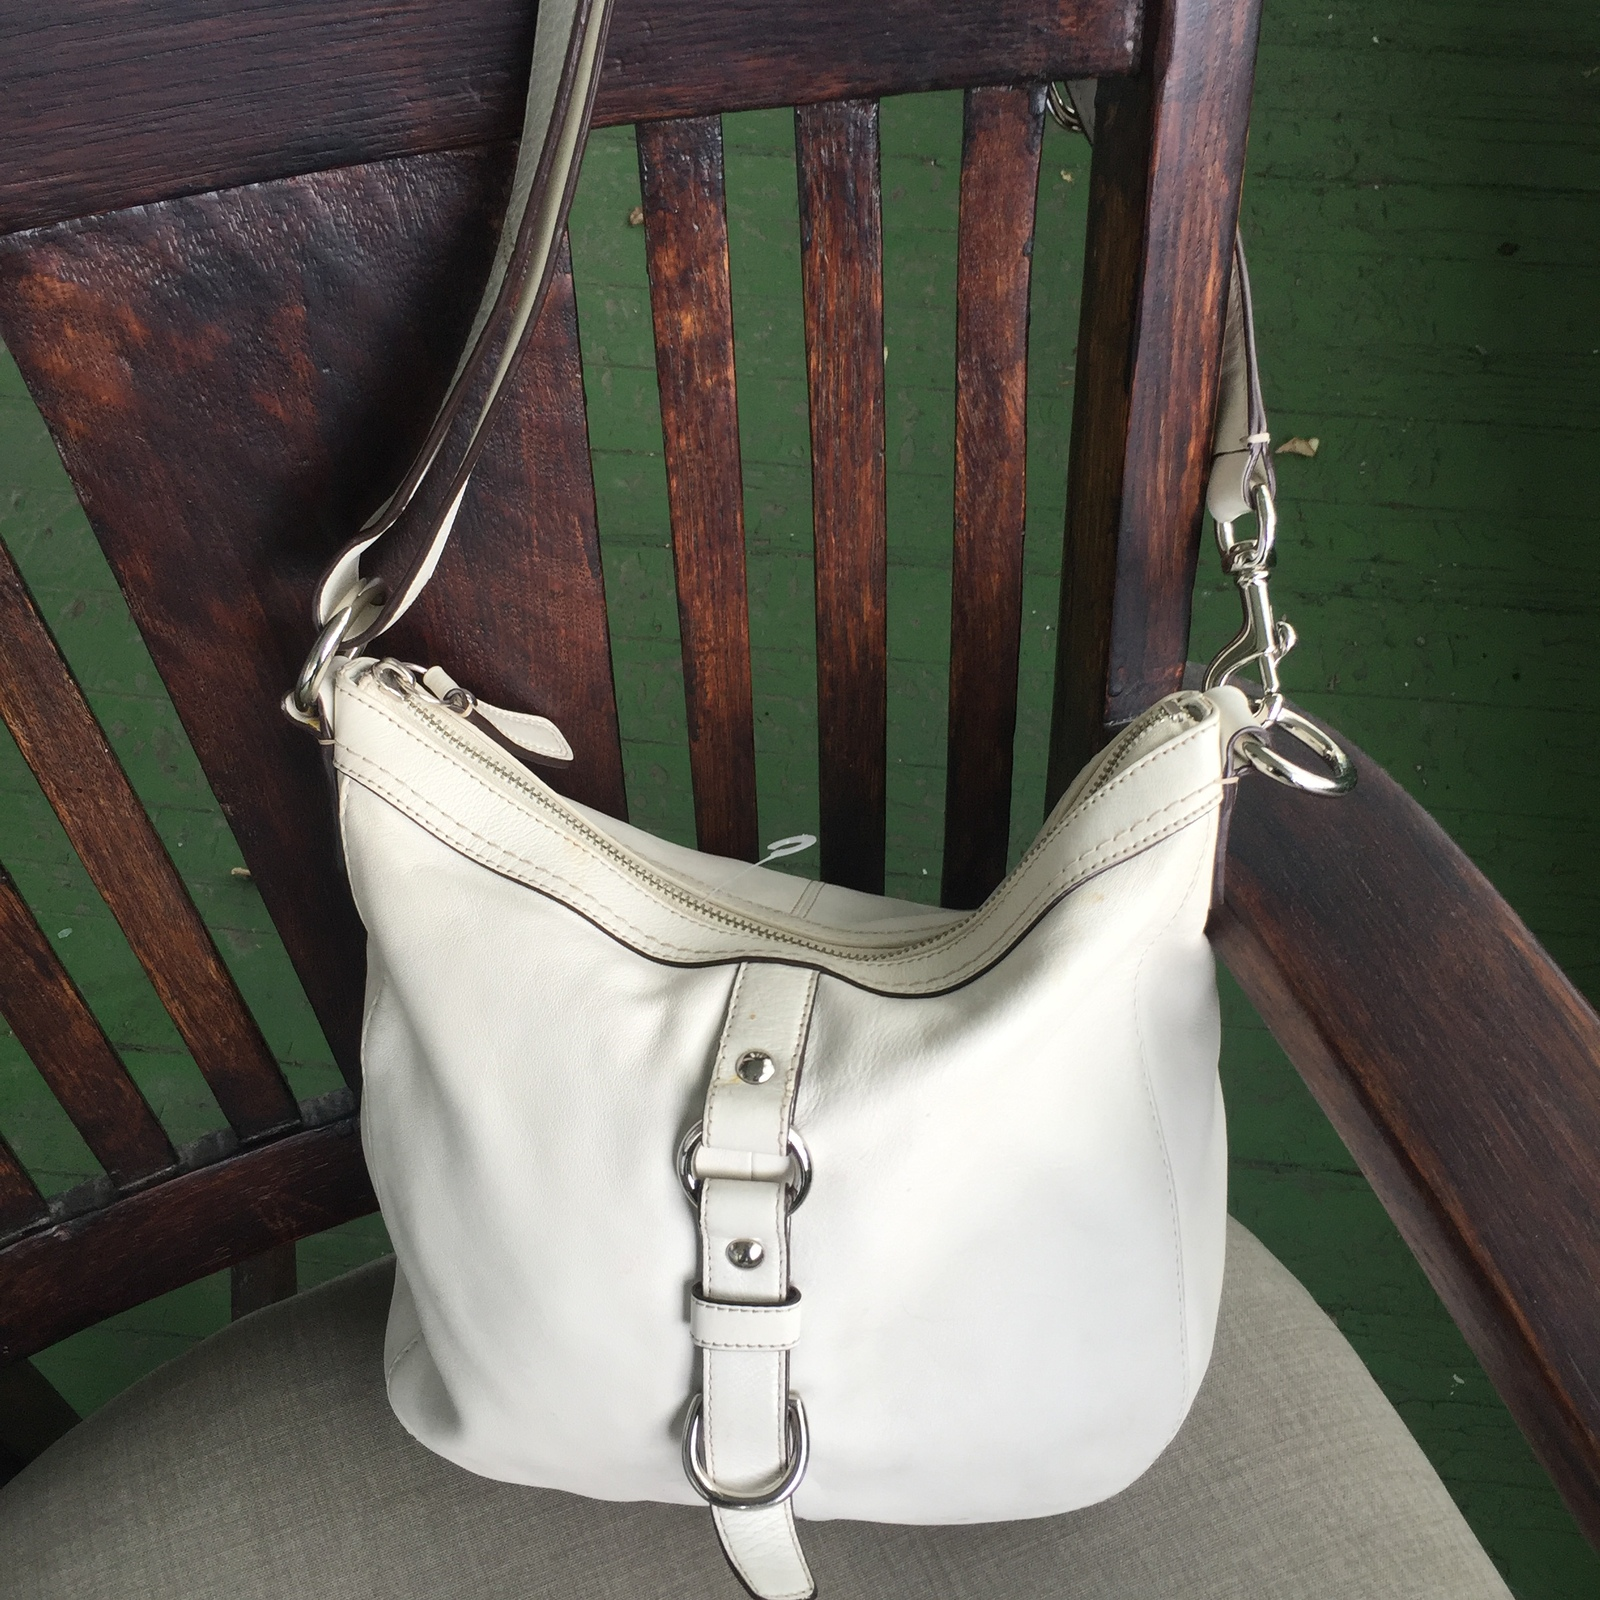 eb2cb8625ed5 Img 5849. Img 5849. Previous. REDUCED! COACH Chelsea Bone white leather  shoulder handbag F14018